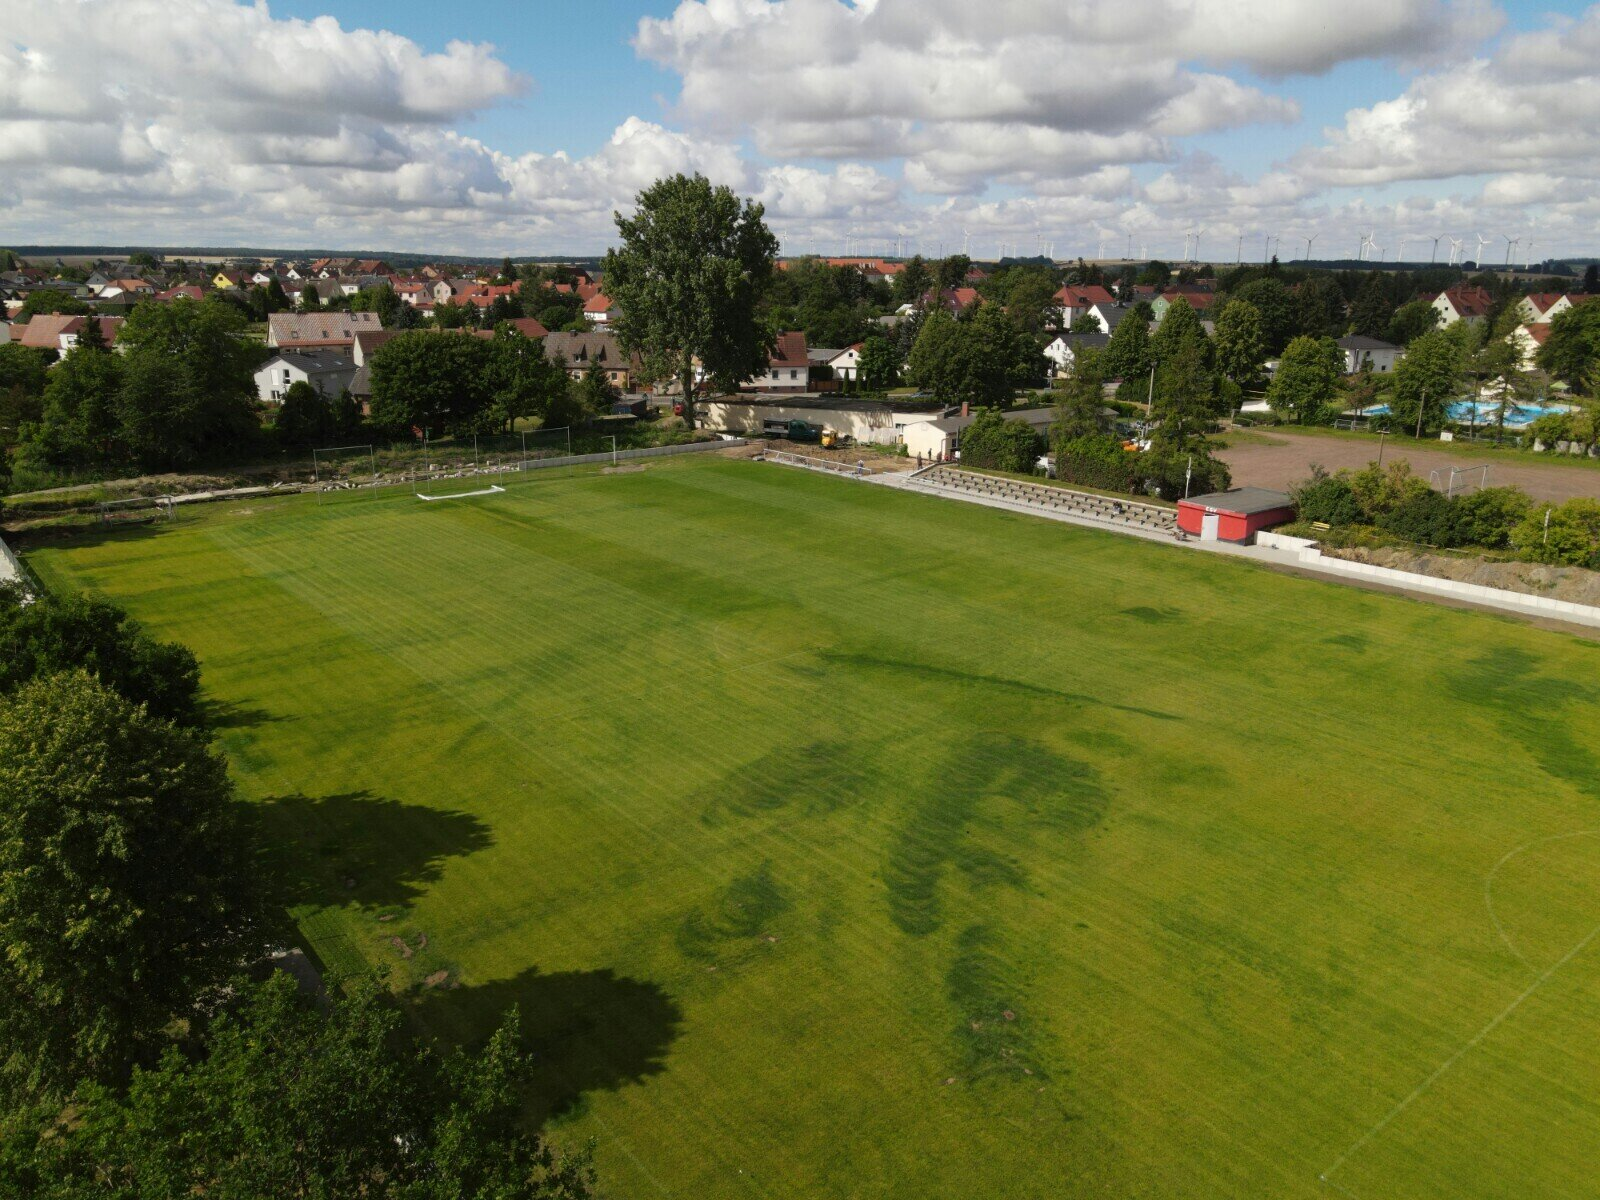 Sportplatz - Rasen